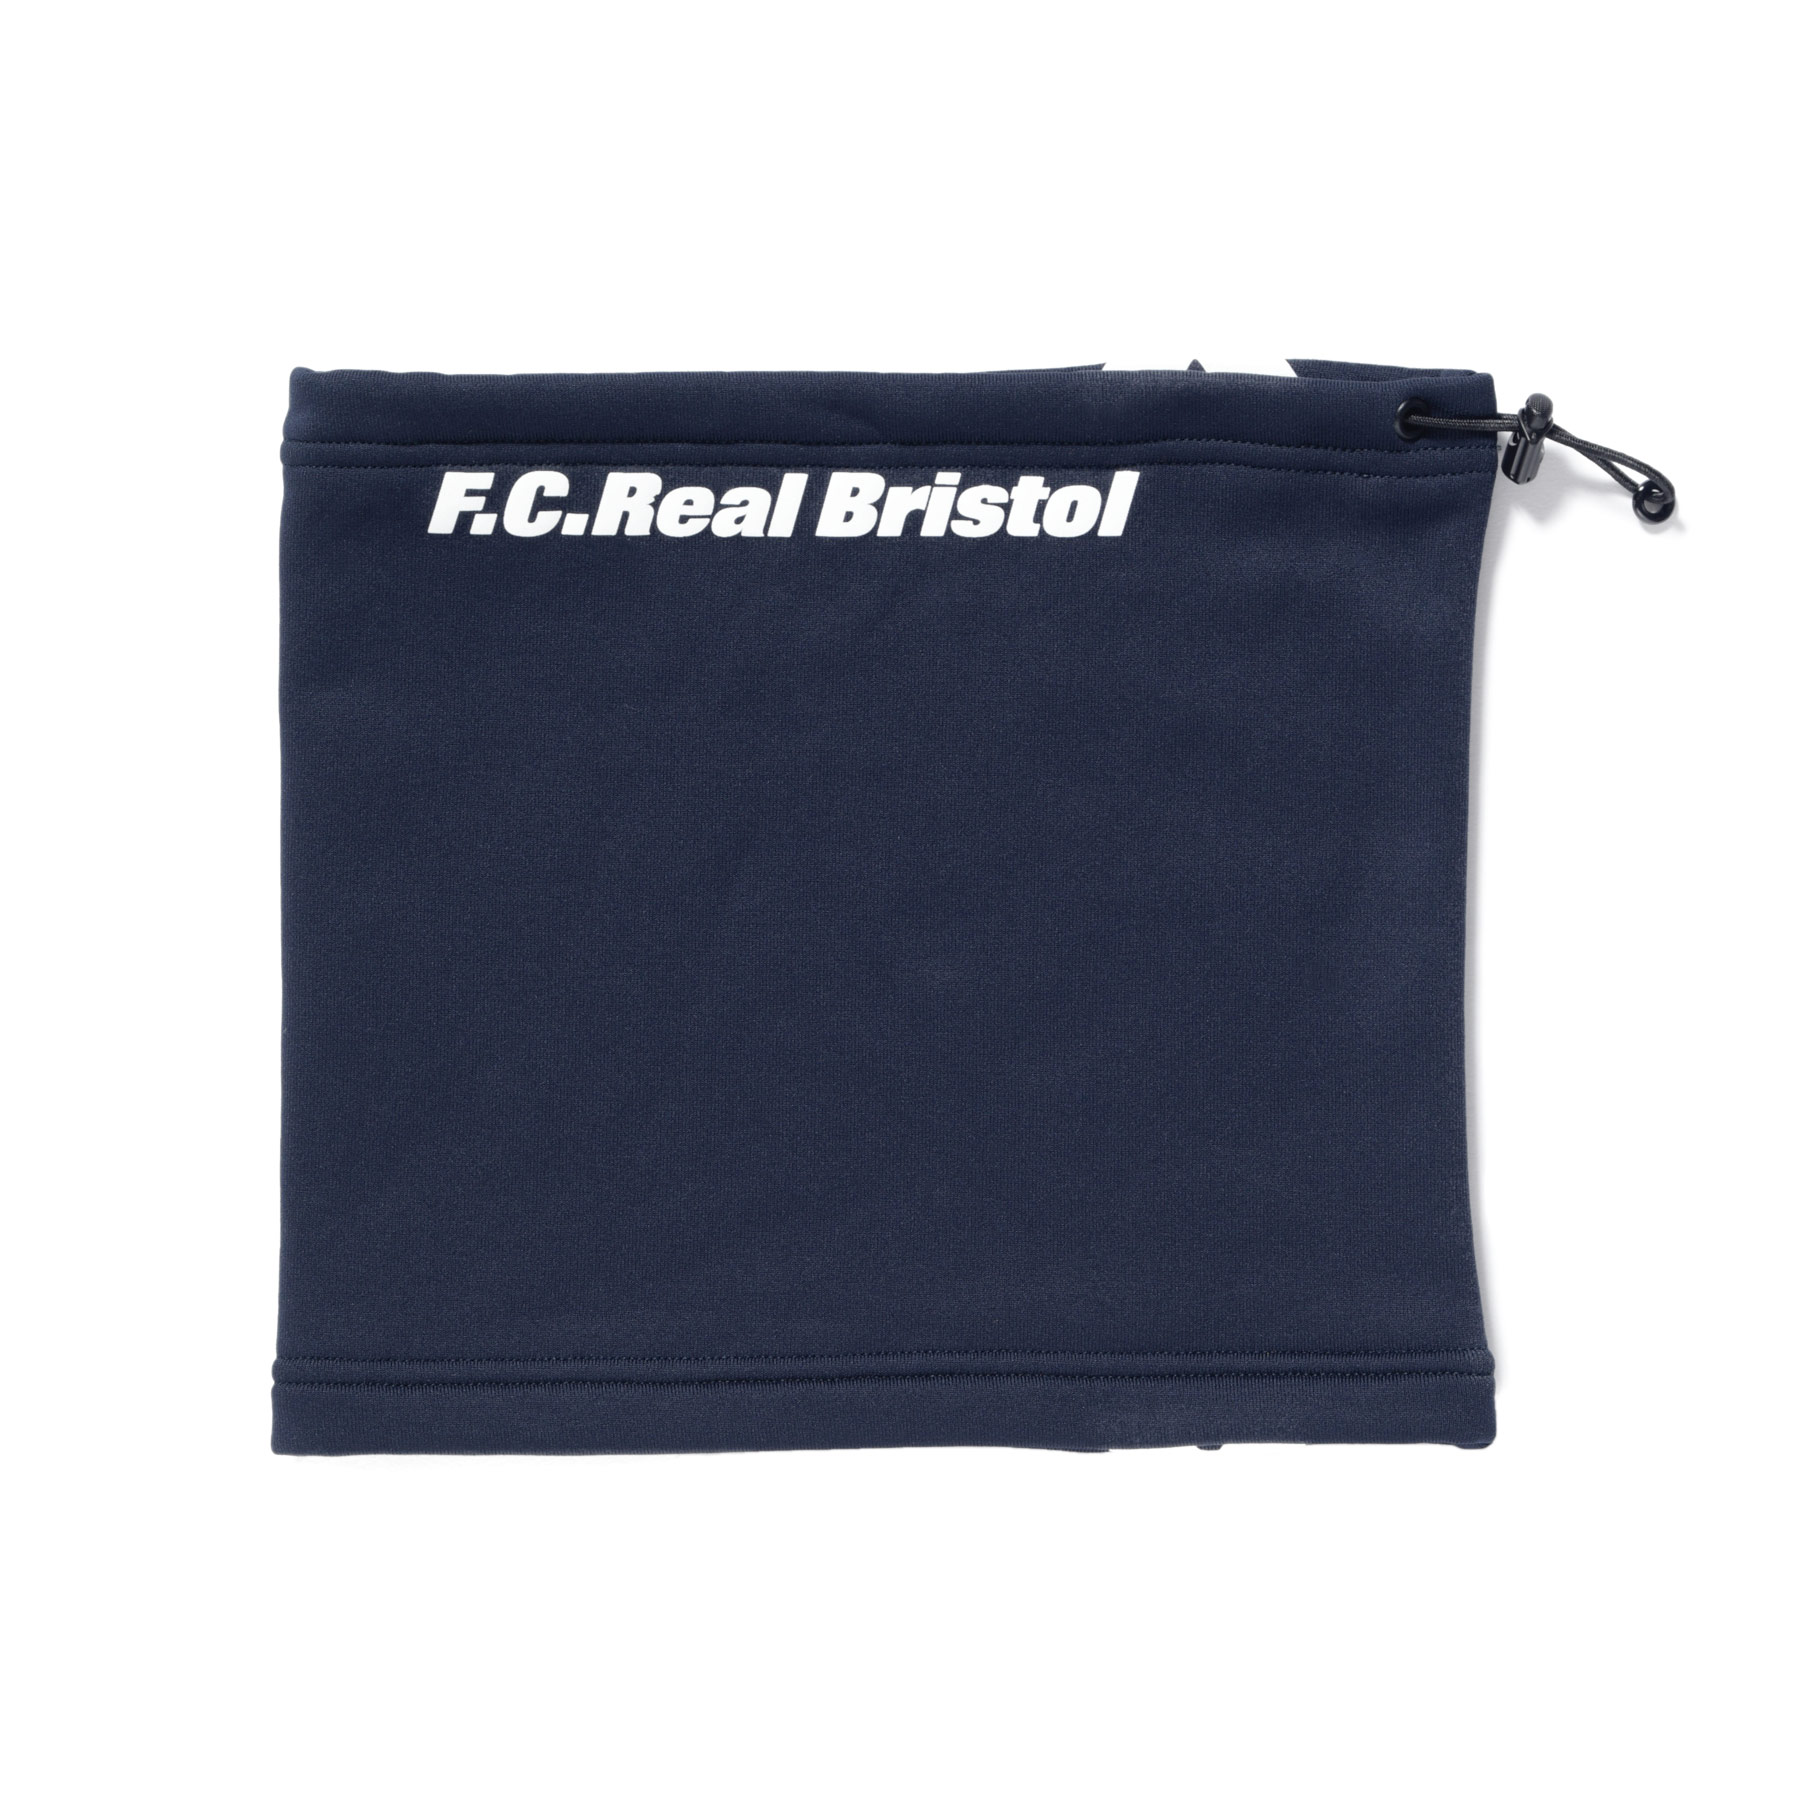 F.C.Real Bristol / POLARTEC FLEECE NECK WARMER -NAVY